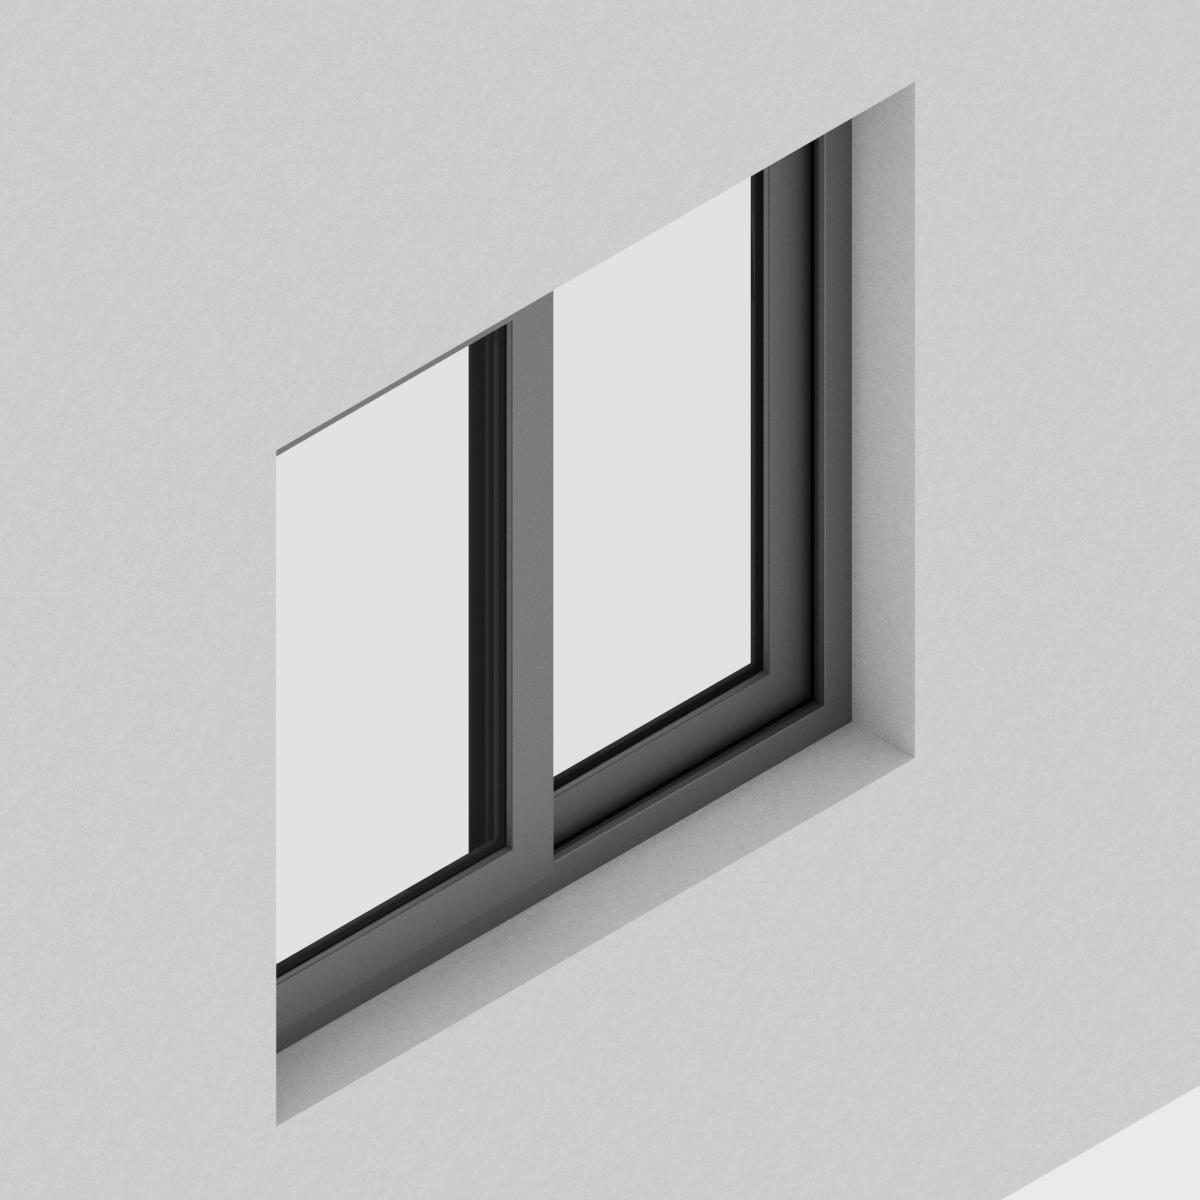 Ventana Corredera Antepecho QT de perfil de Aluminio con RPT